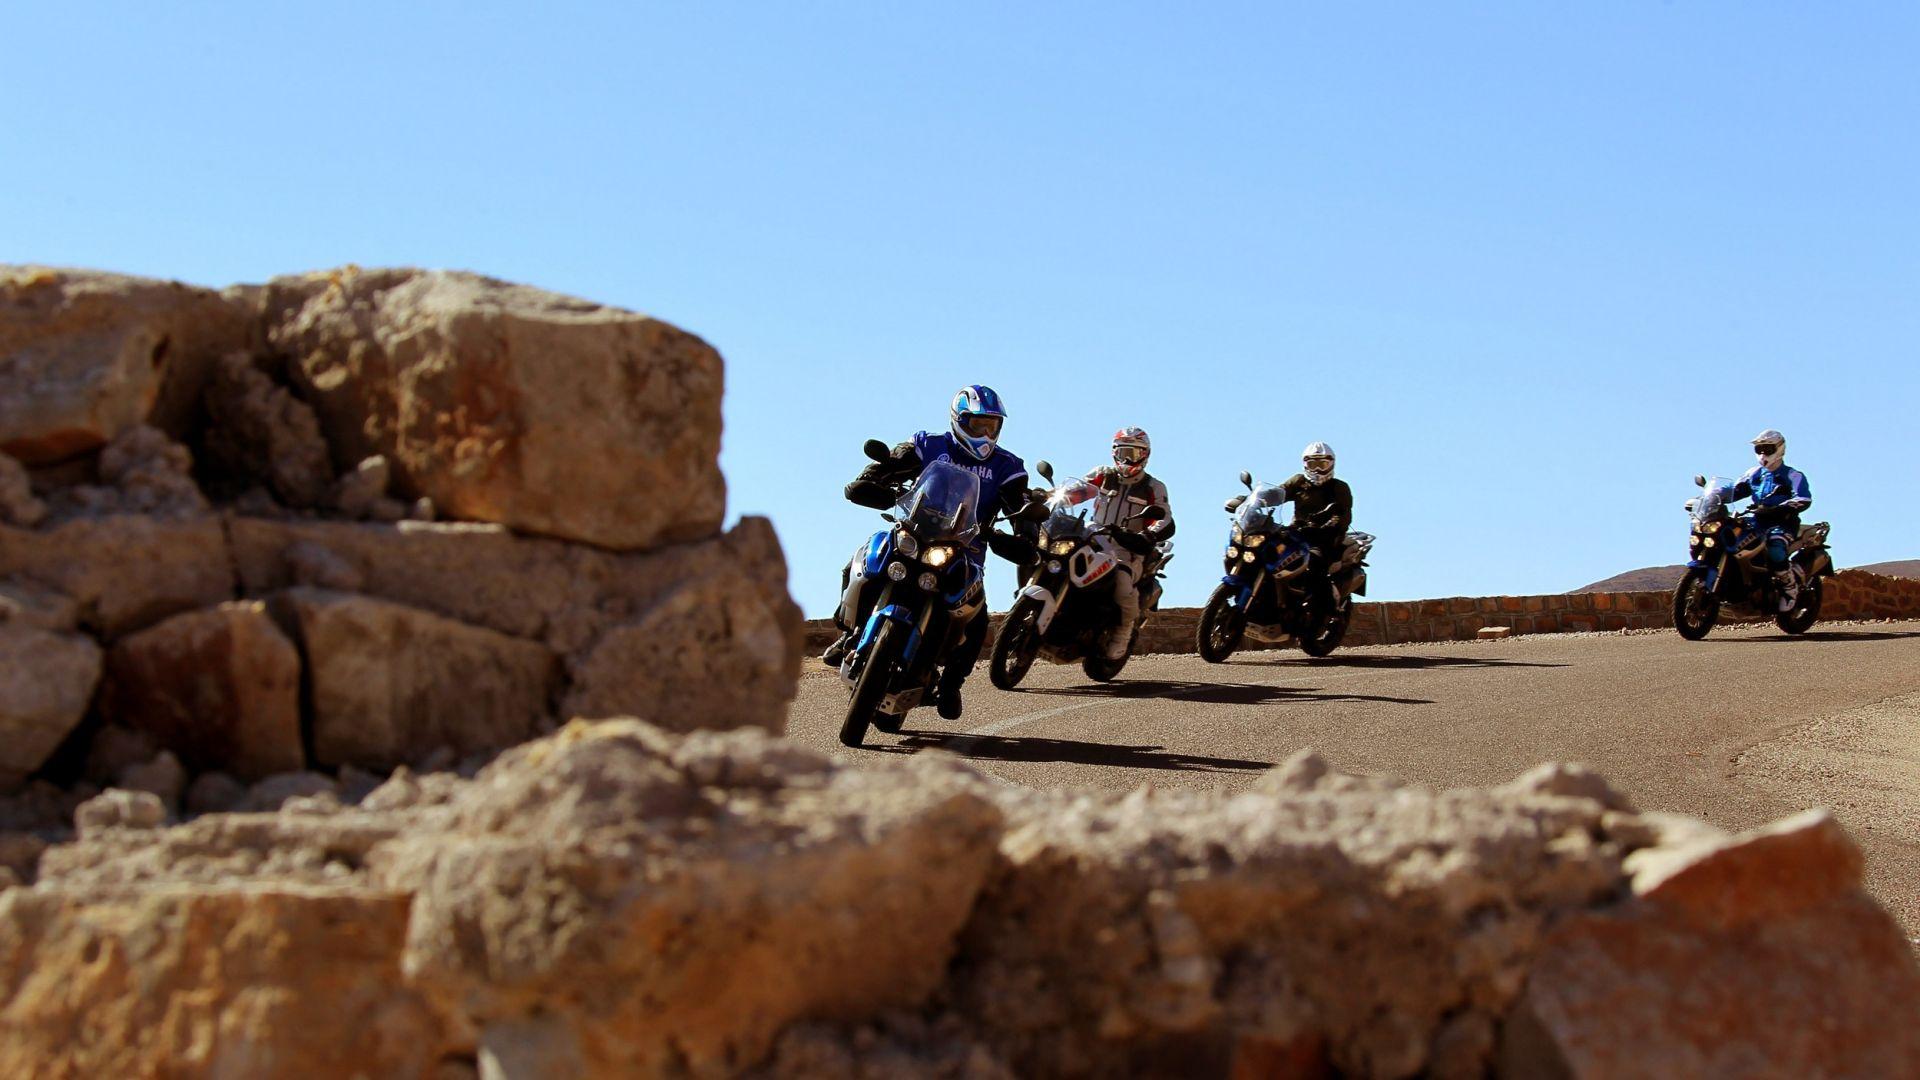 Immagine 42: In Marocco con la Yamaha Super Ténéré